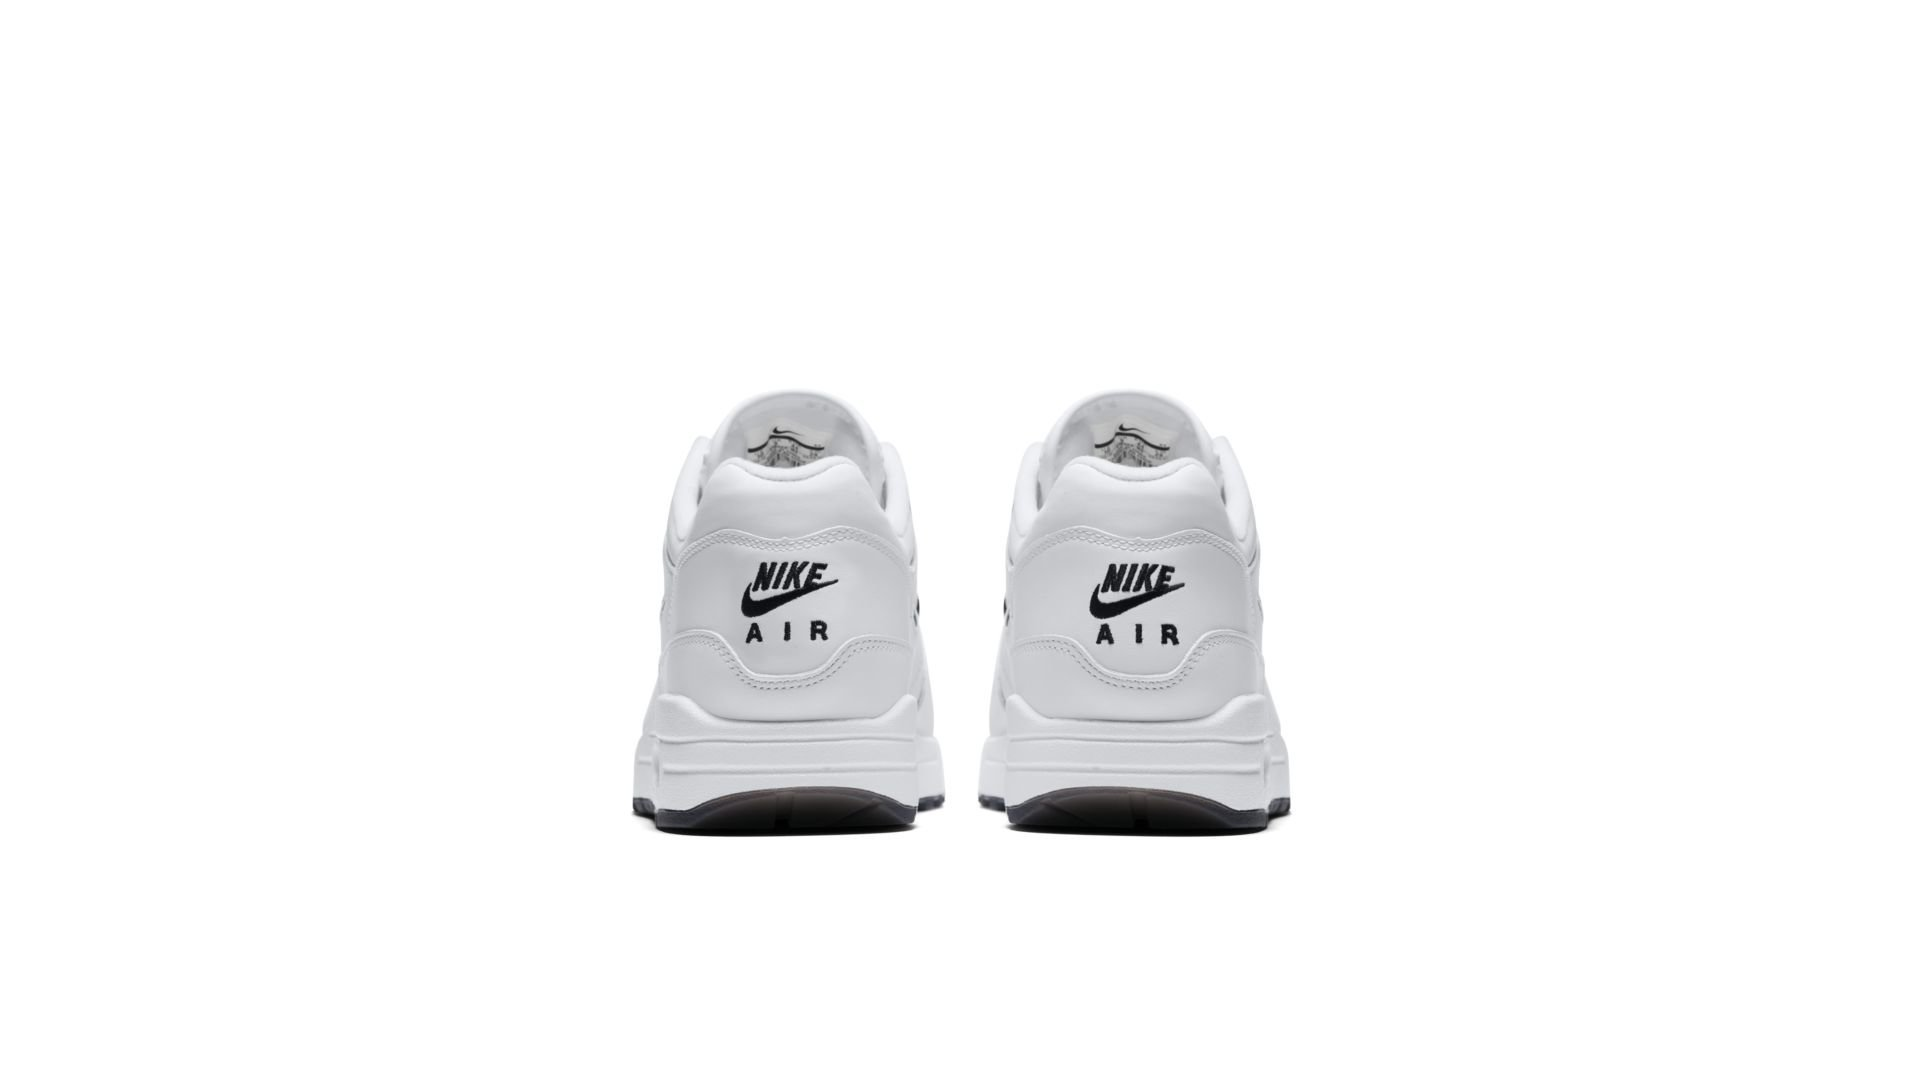 Nike AIr Max 1 Jewel Black (918354-103)